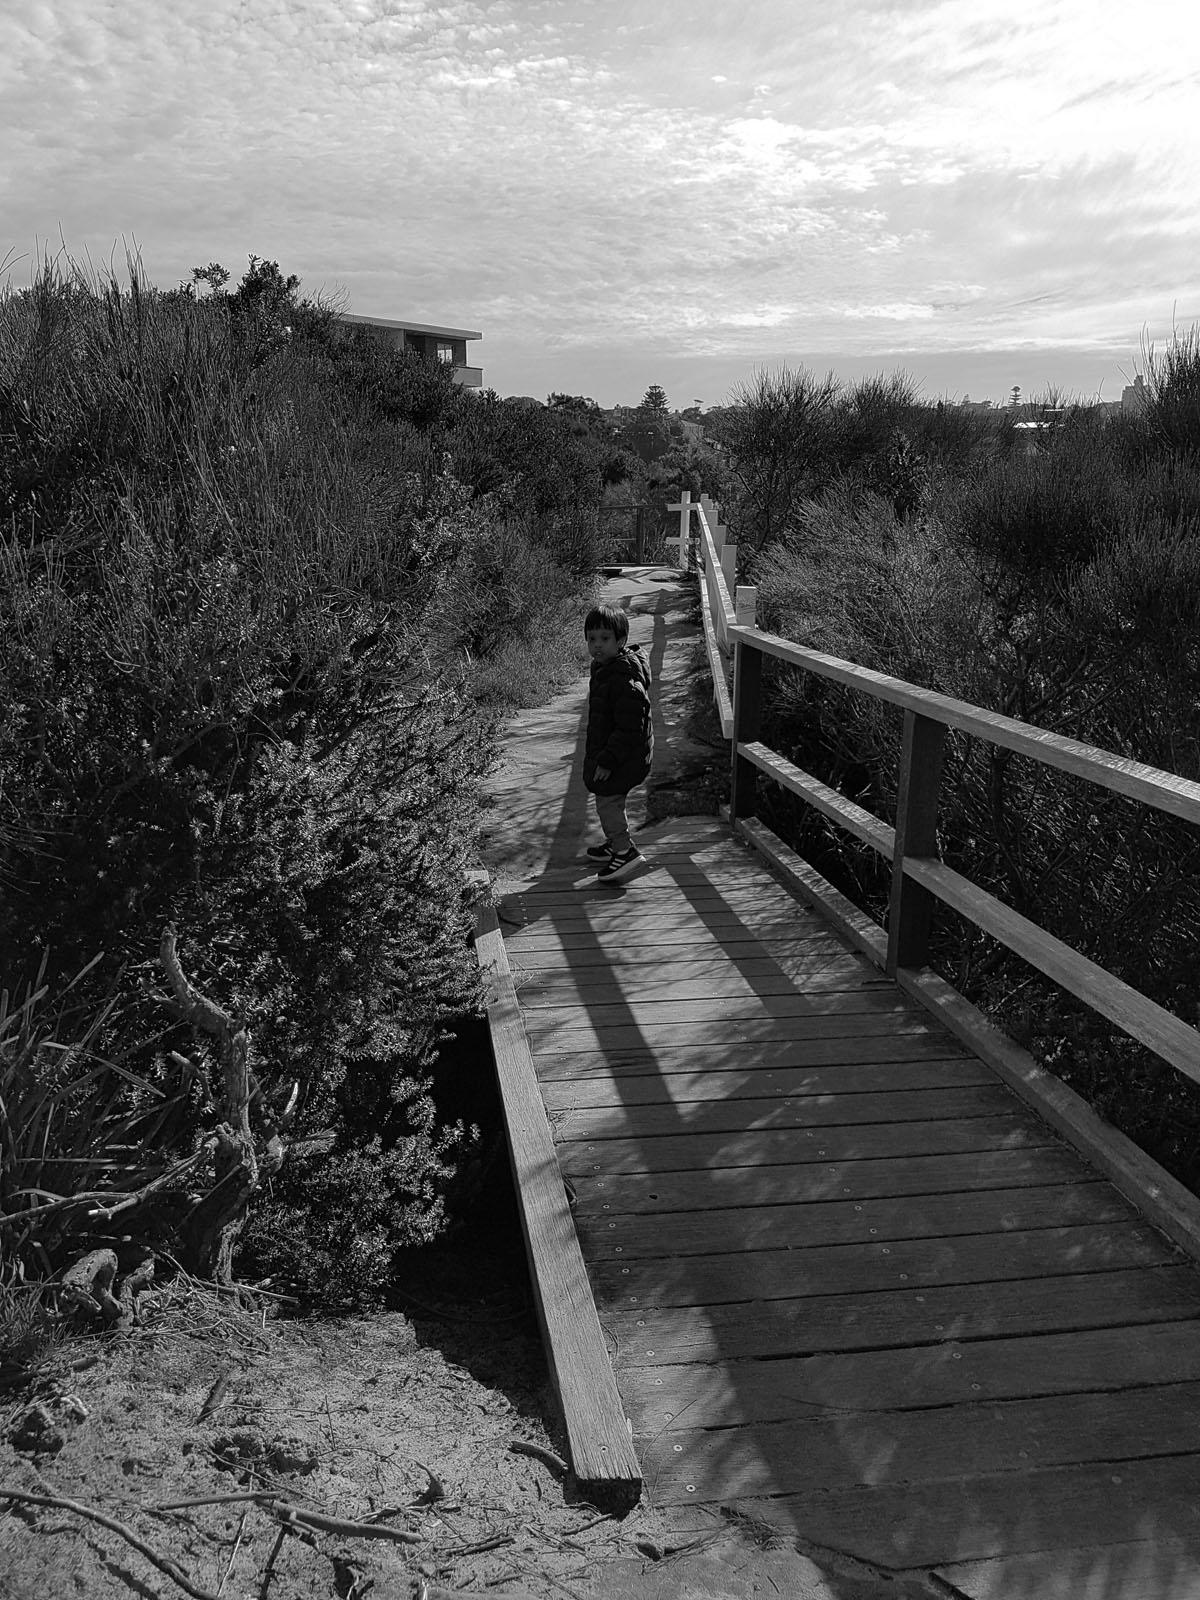 SGMT Australia Sydney_Bondi to Coogee Coastal Walk_10 Coastal vegetation